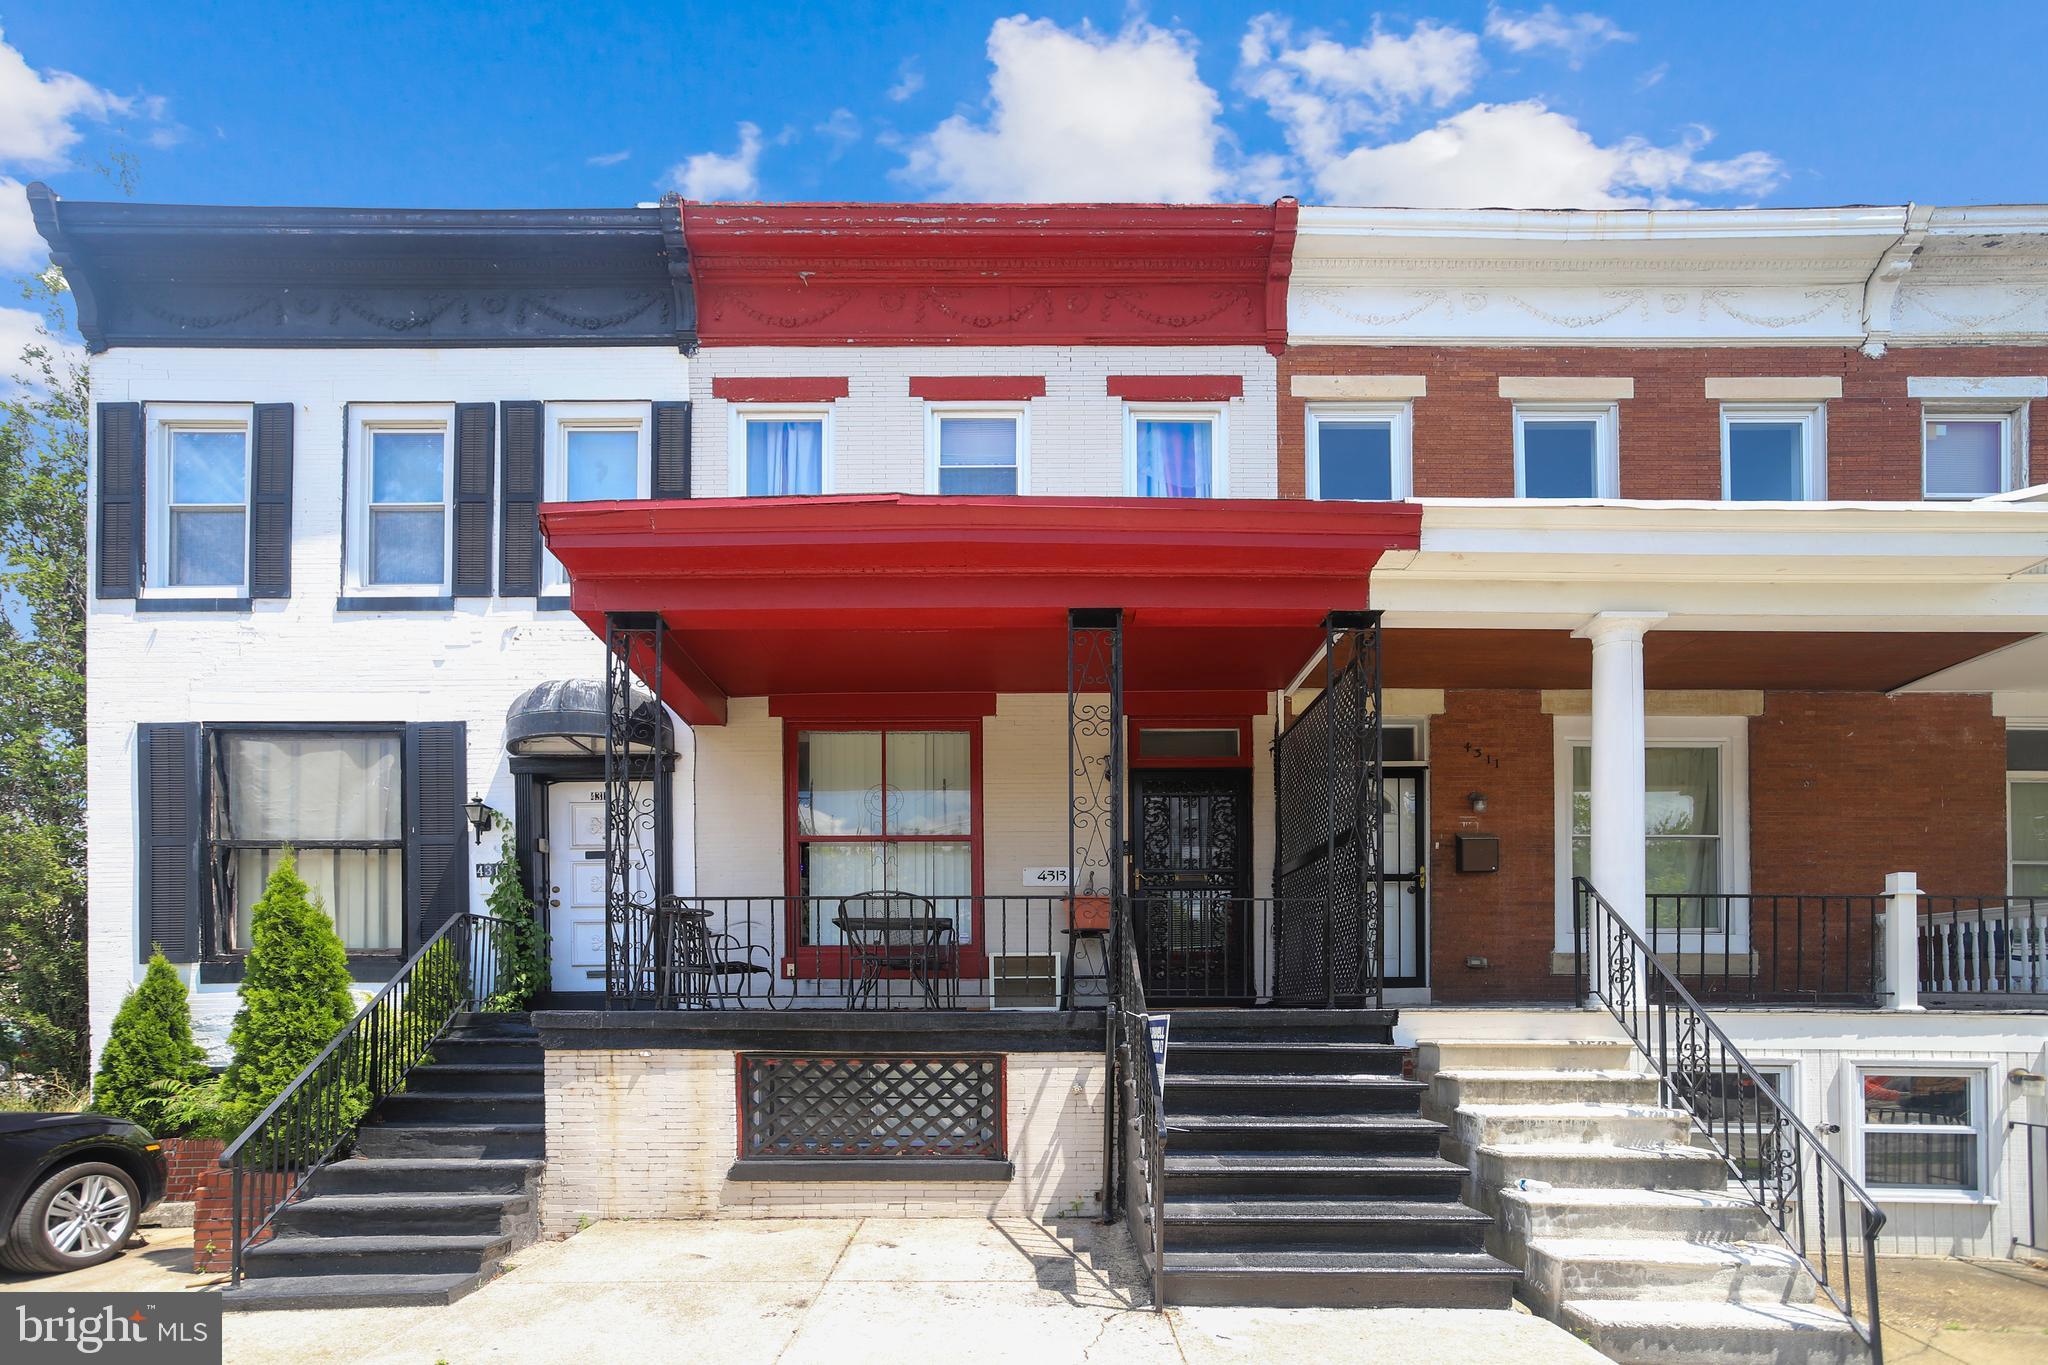 4313 YORK ROAD, BALTIMORE, Maryland 21212, 3 Bedrooms Bedrooms, ,1 BathroomBathrooms,Townhouse,For Sale,4313 YORK ROAD,MDBA531832